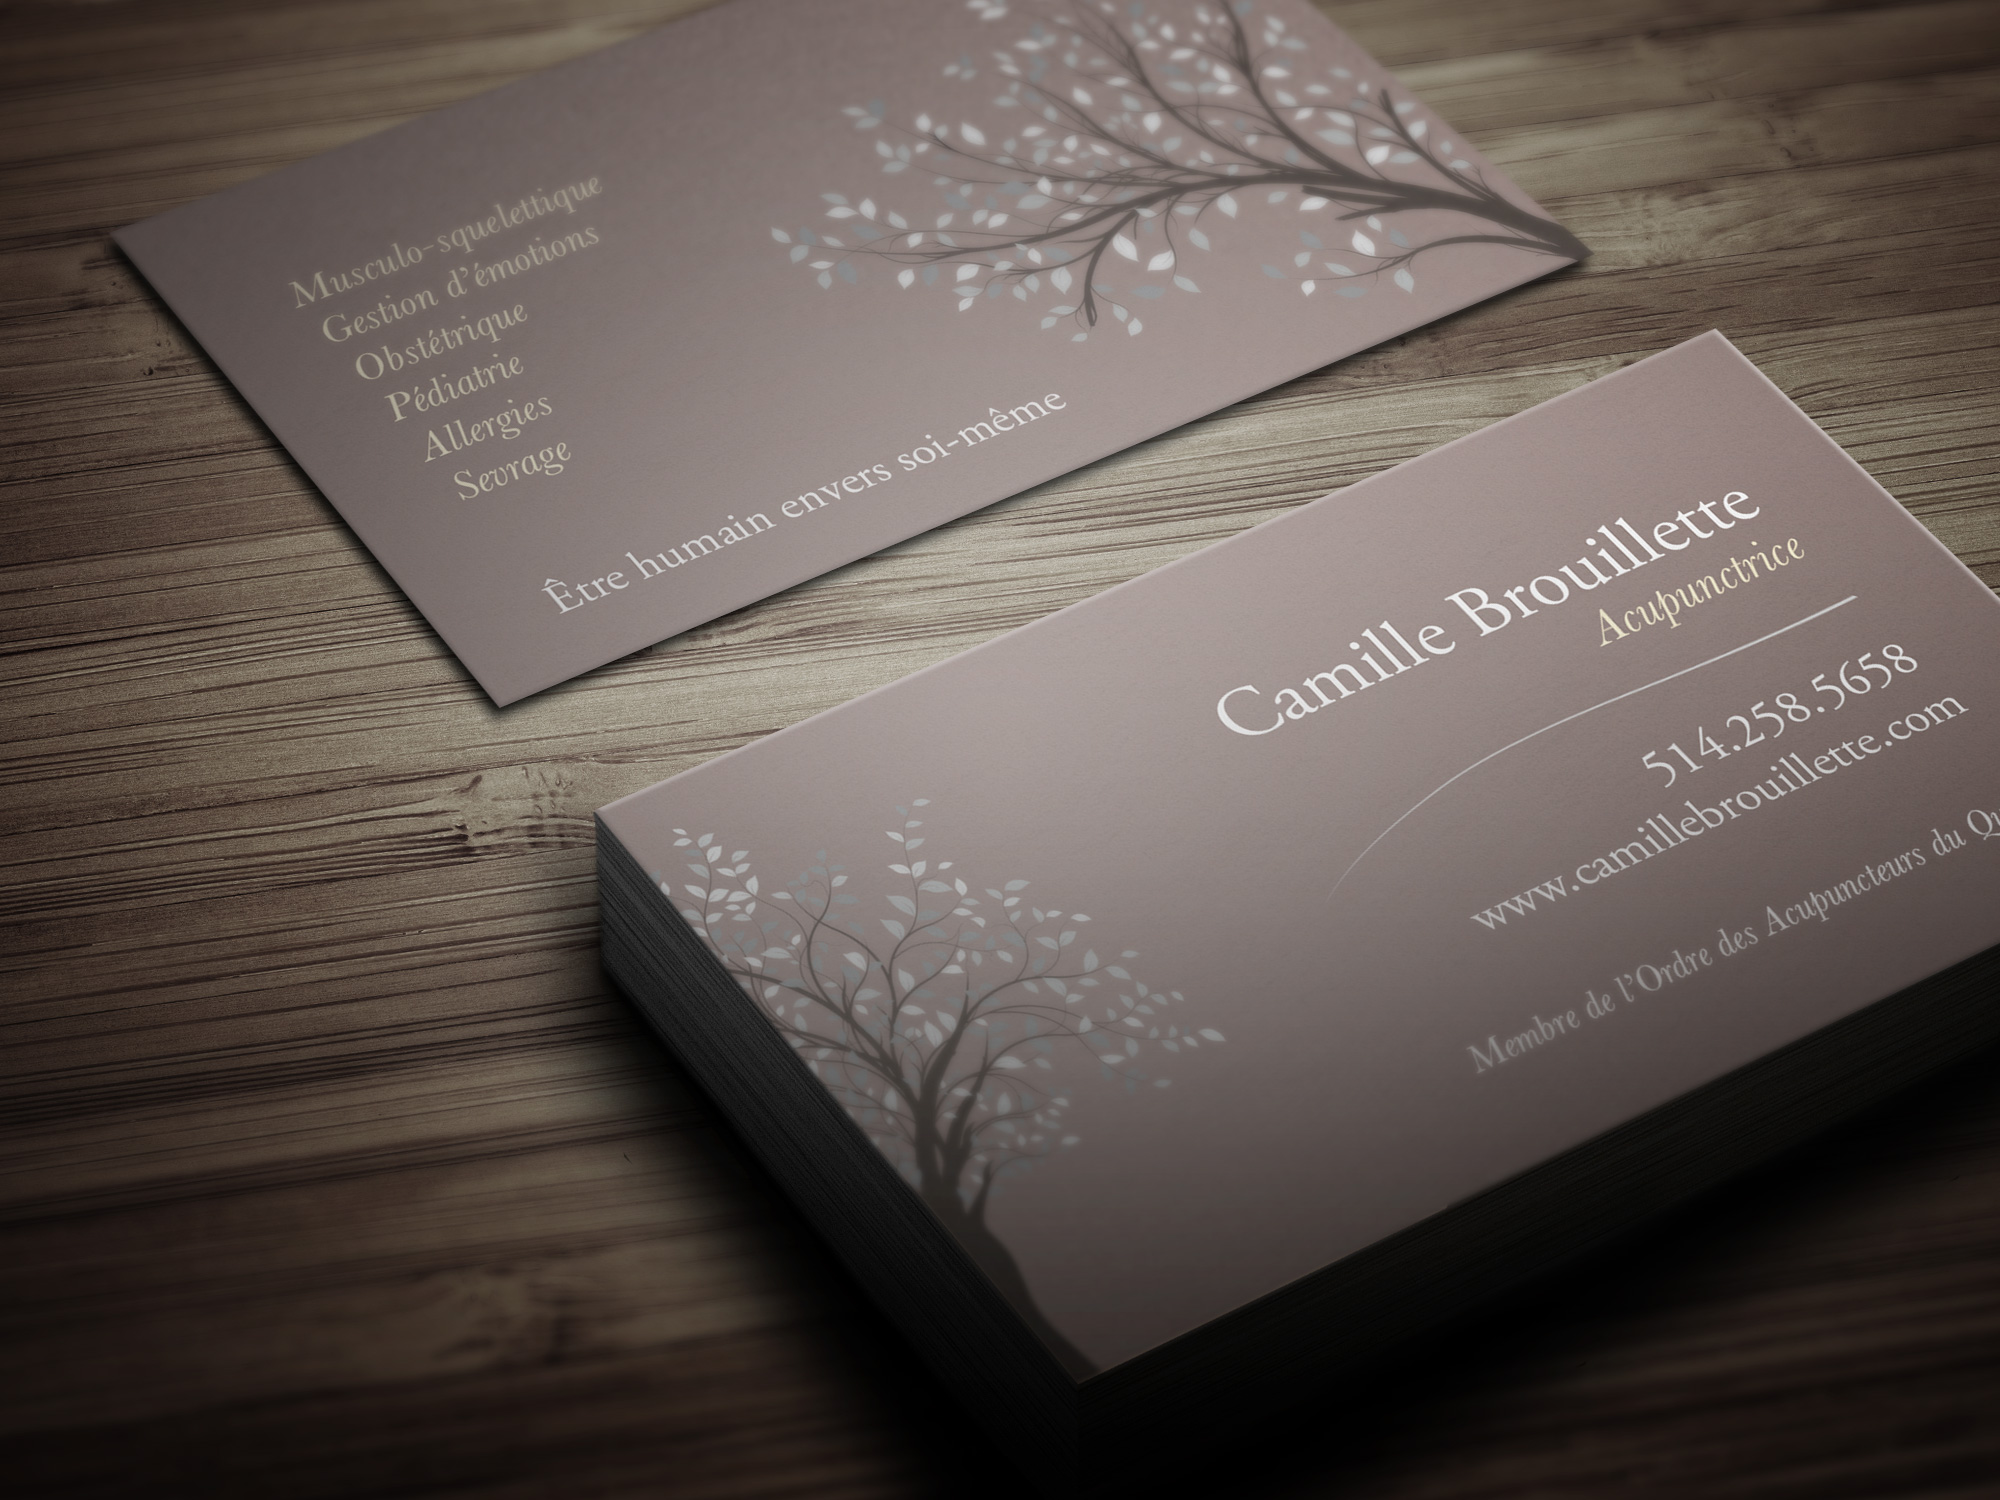 cb-cartes1